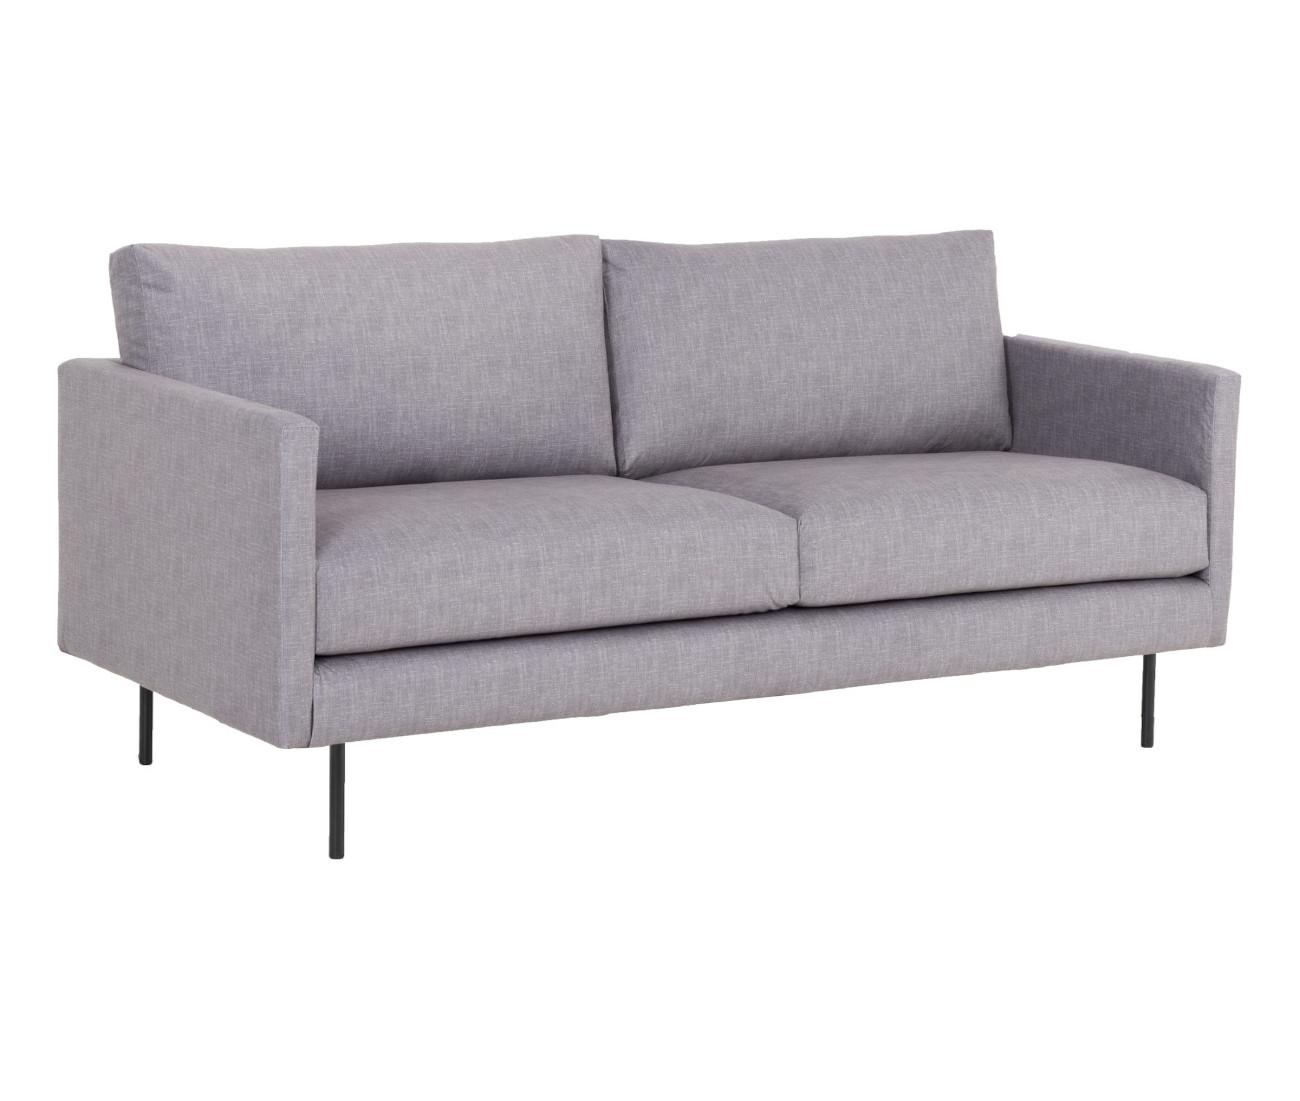 Slim 165 sohva (177 cm) Suit verhoilulla, Noronen